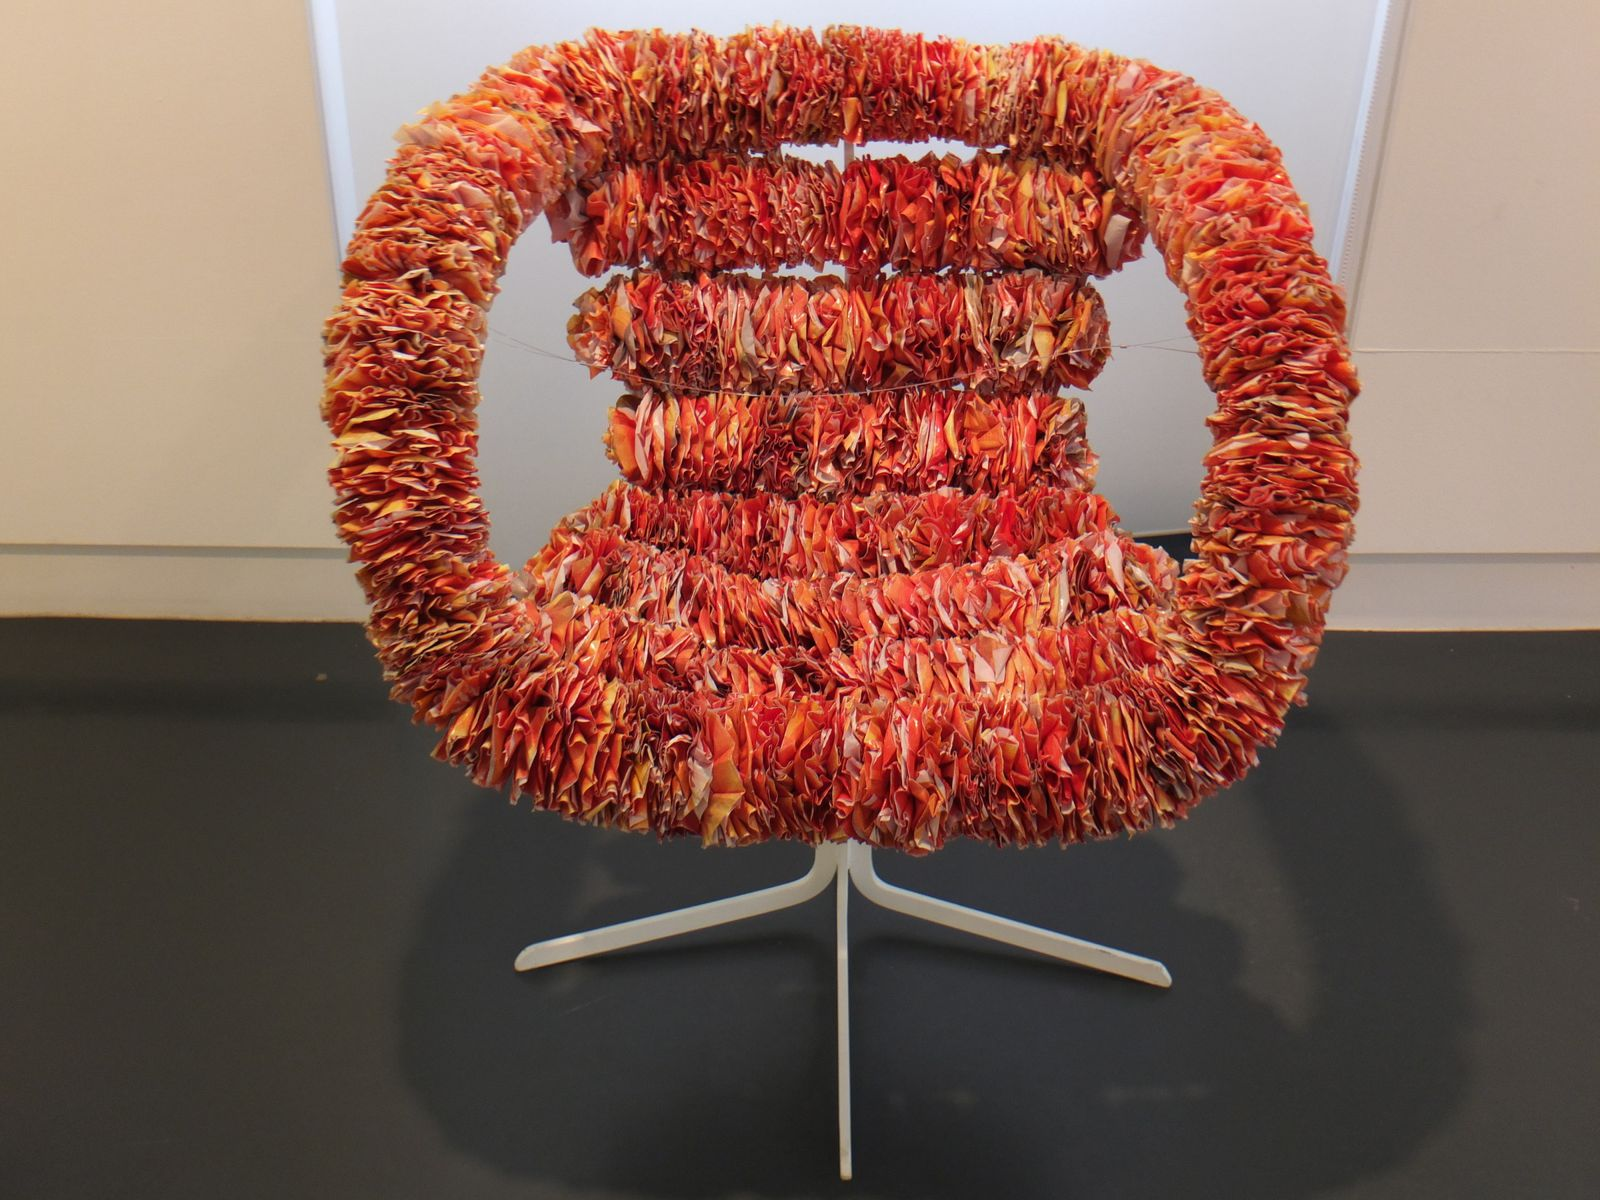 """Inkuku Chair"" (acier, sacs en plastique) de Ryan Frank, 2006. Un bel objet."